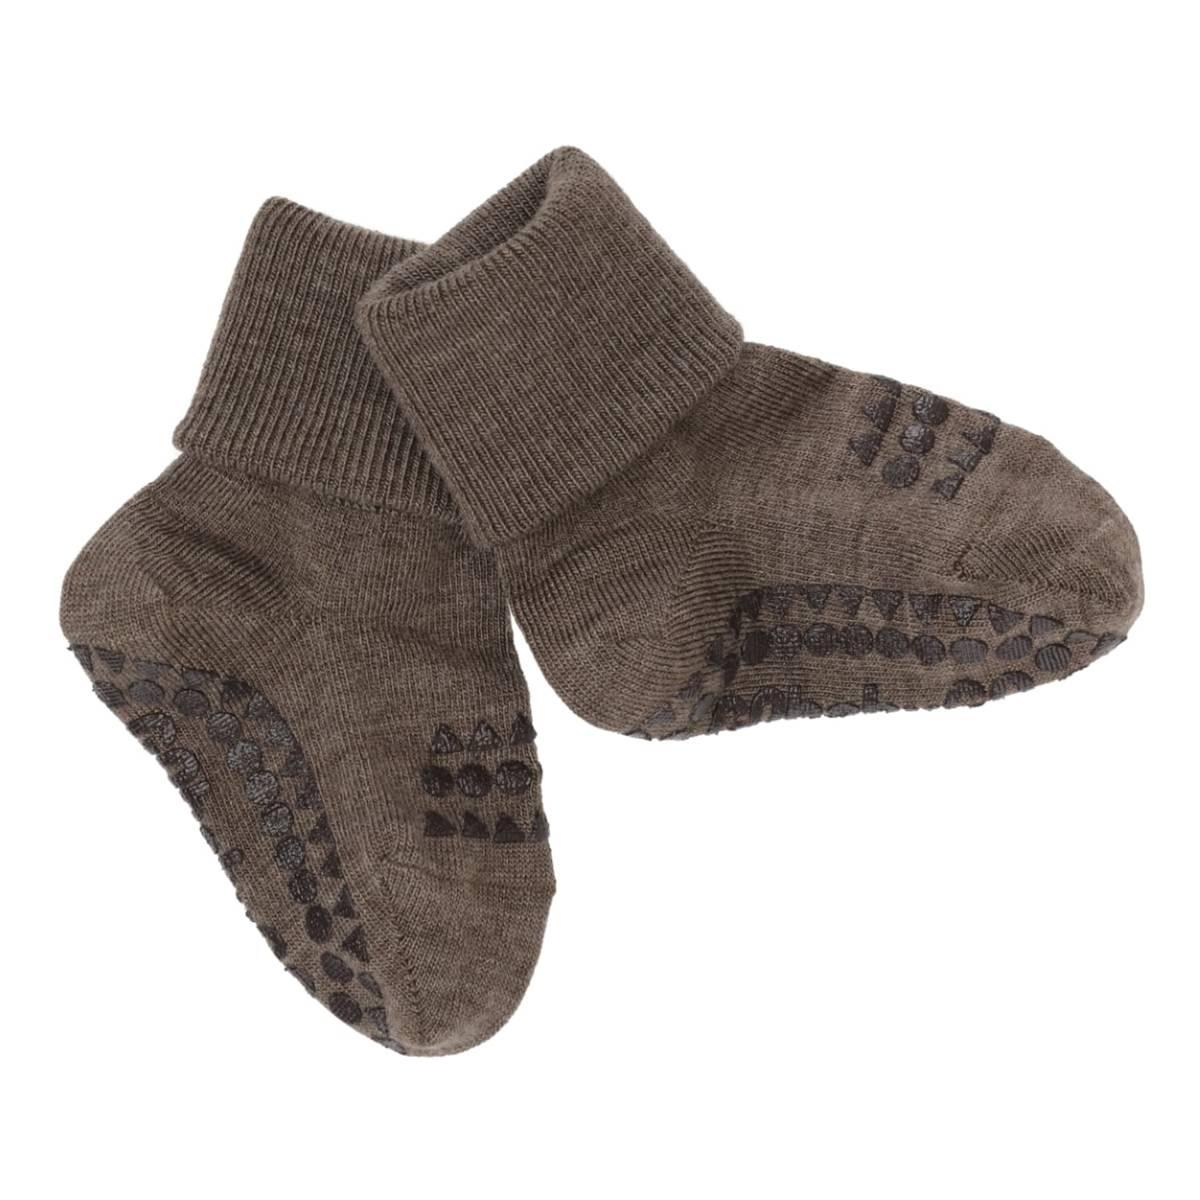 GoBabyGo antiskli sokker ull - brun